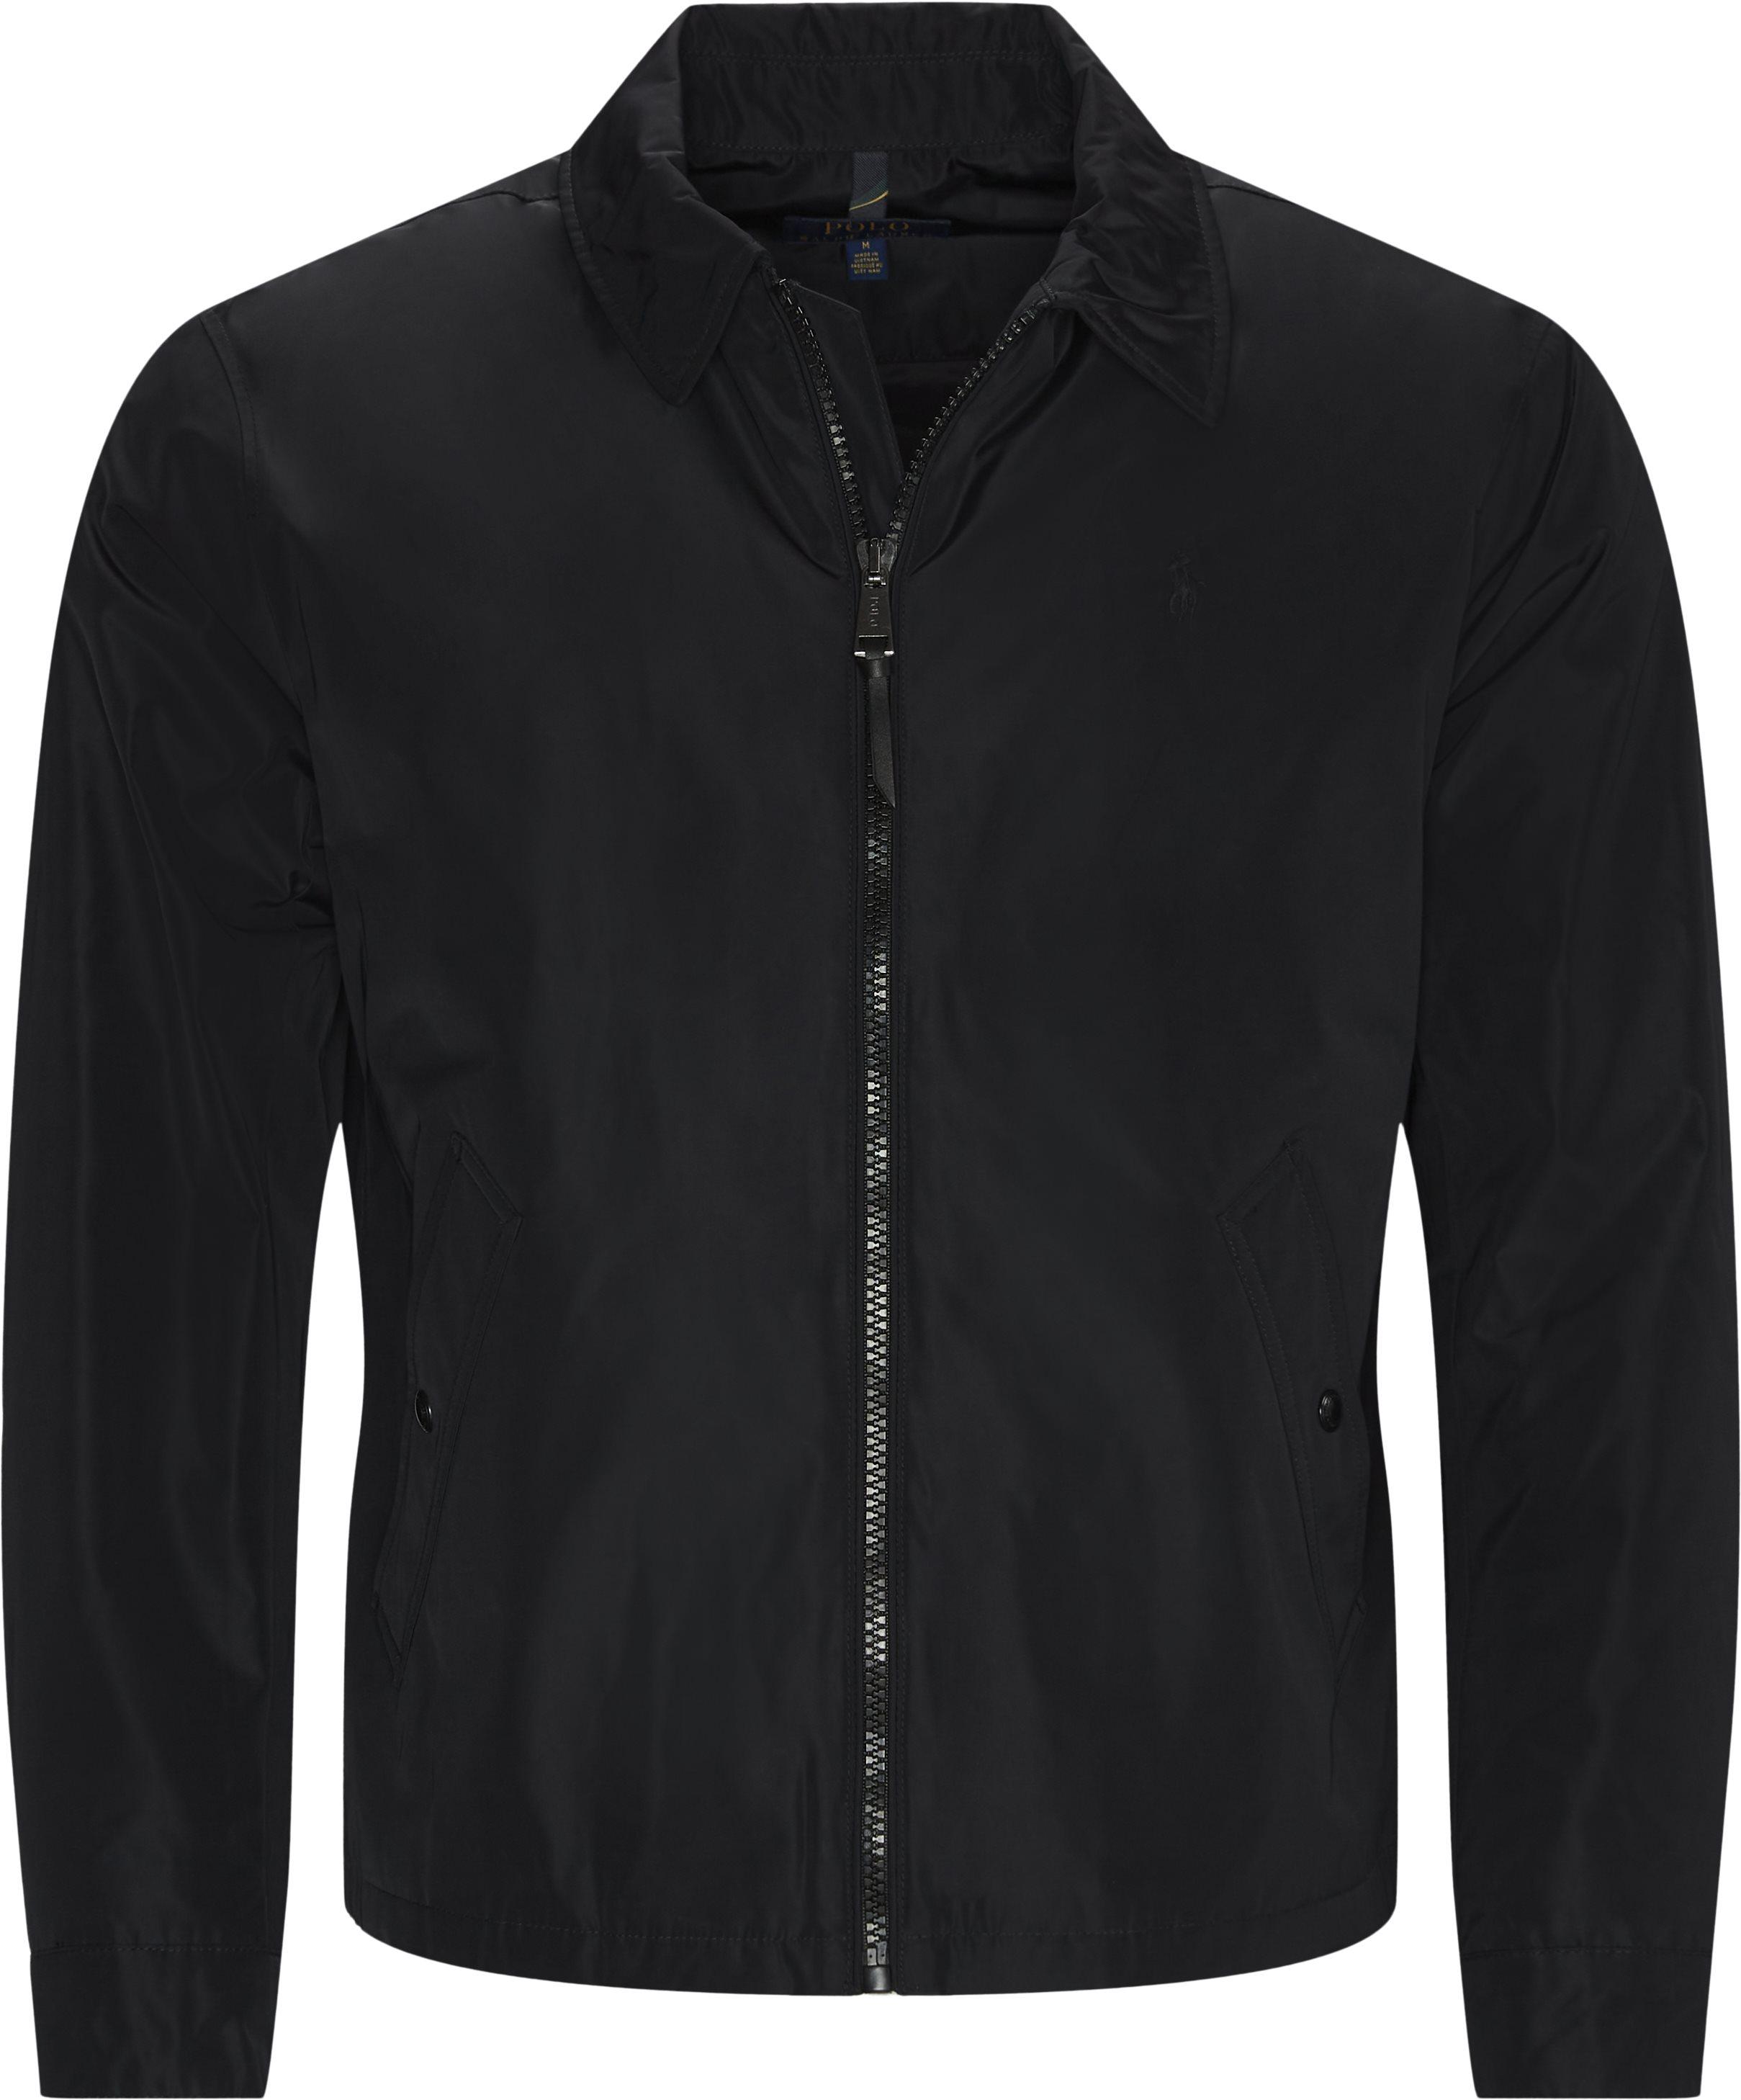 Water Repellent Jacket - Jackets - Regular - Black